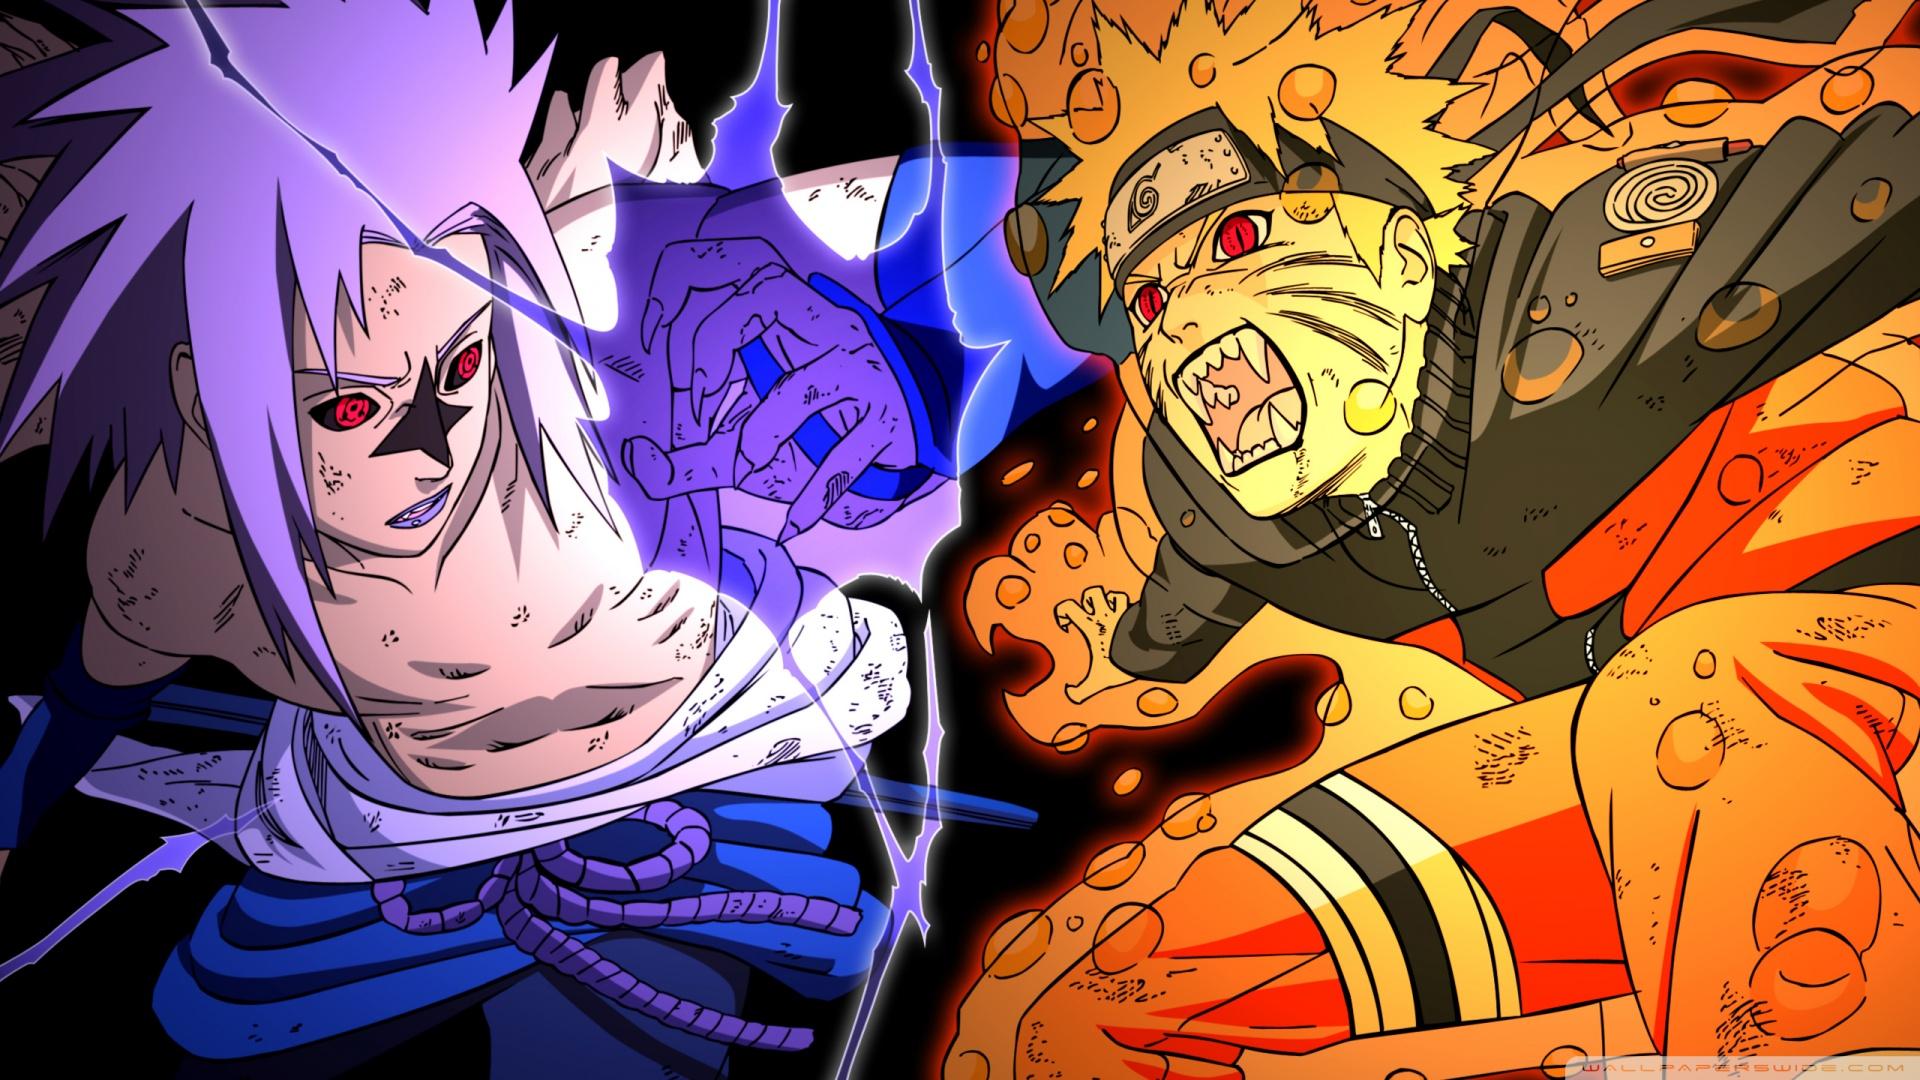 Fond d'écran : Anime, Naruto Shippuuden 1920x1080 - Dragneel - 1199432 - Fond d'écran - WallHere